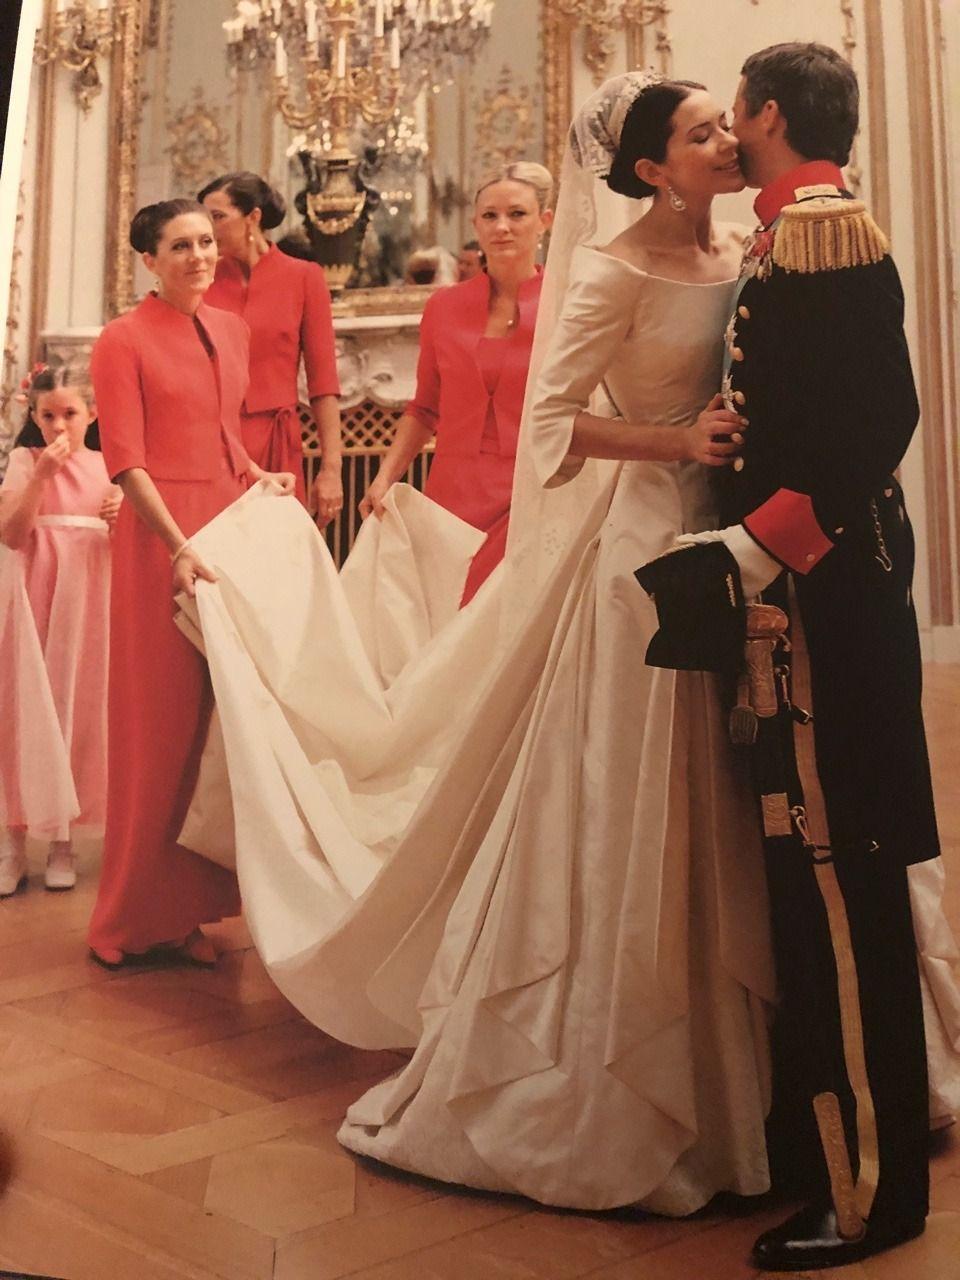 Danish Royal Family Royal Wedding Gowns Royal Weddings Royal Brides [ 1280 x 960 Pixel ]